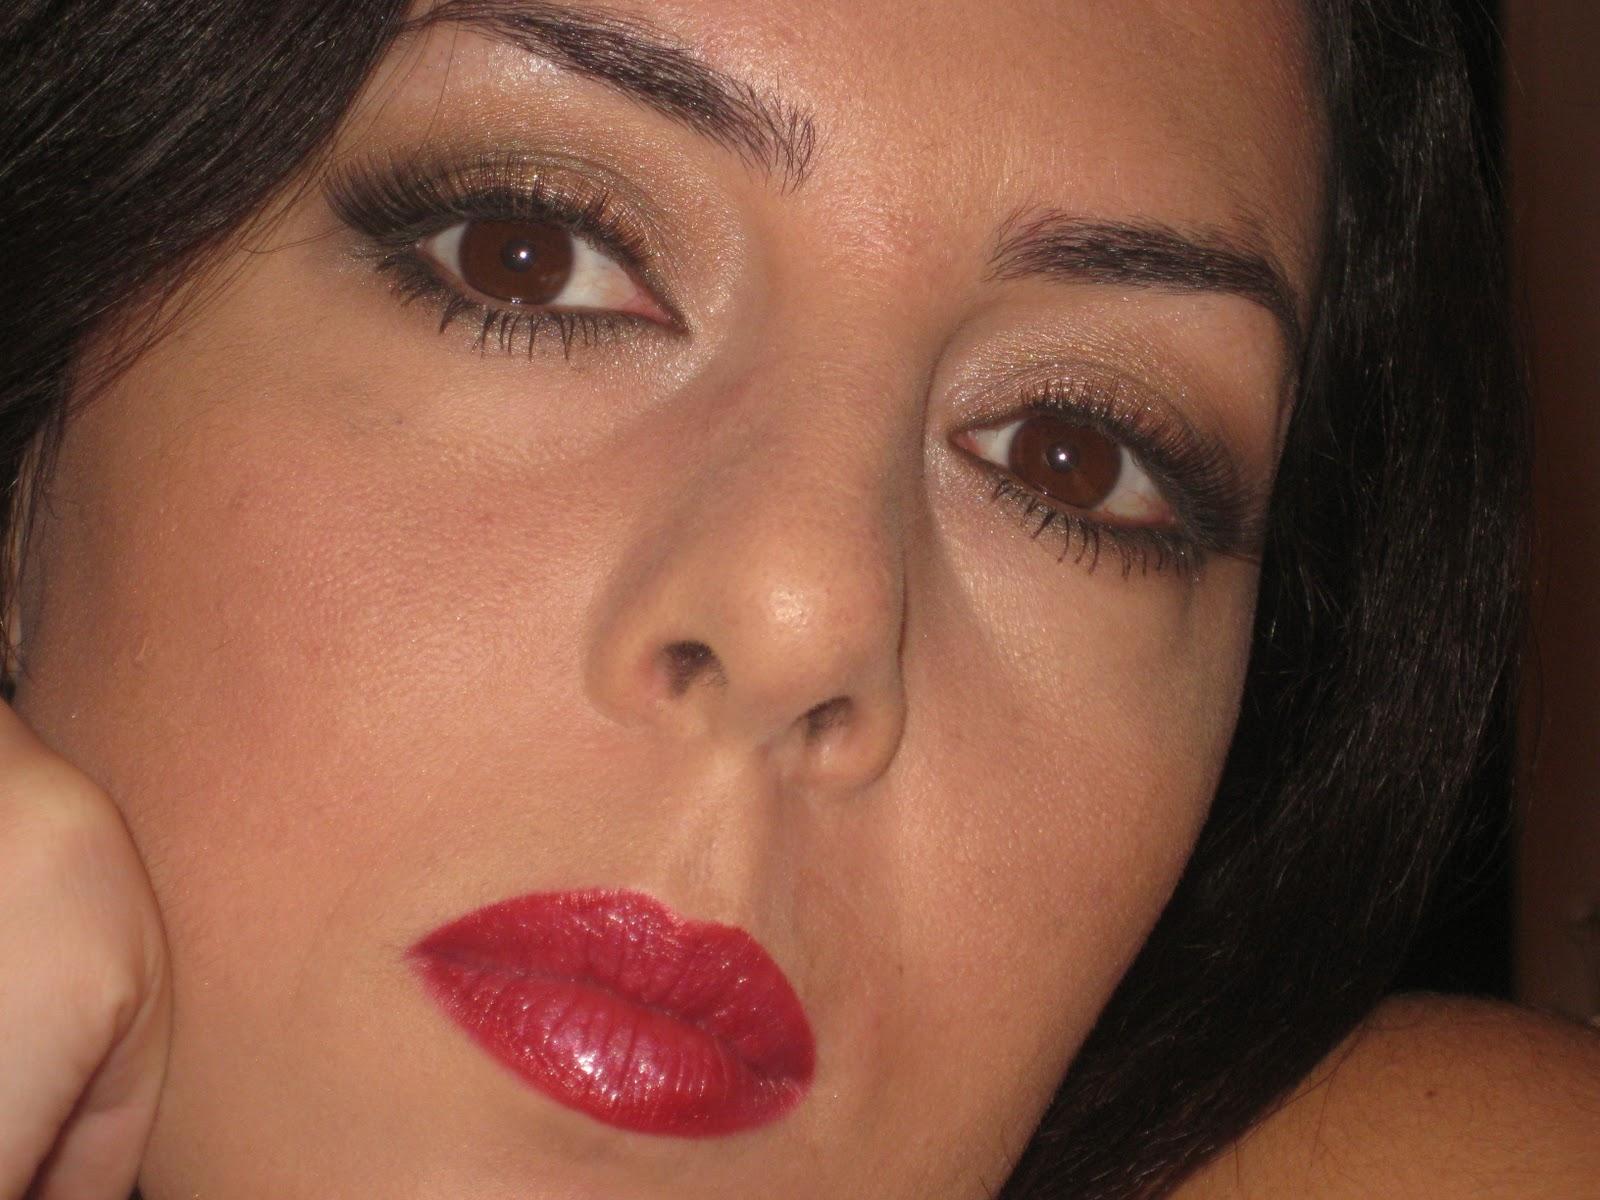 Фото макияжа моники белуччи